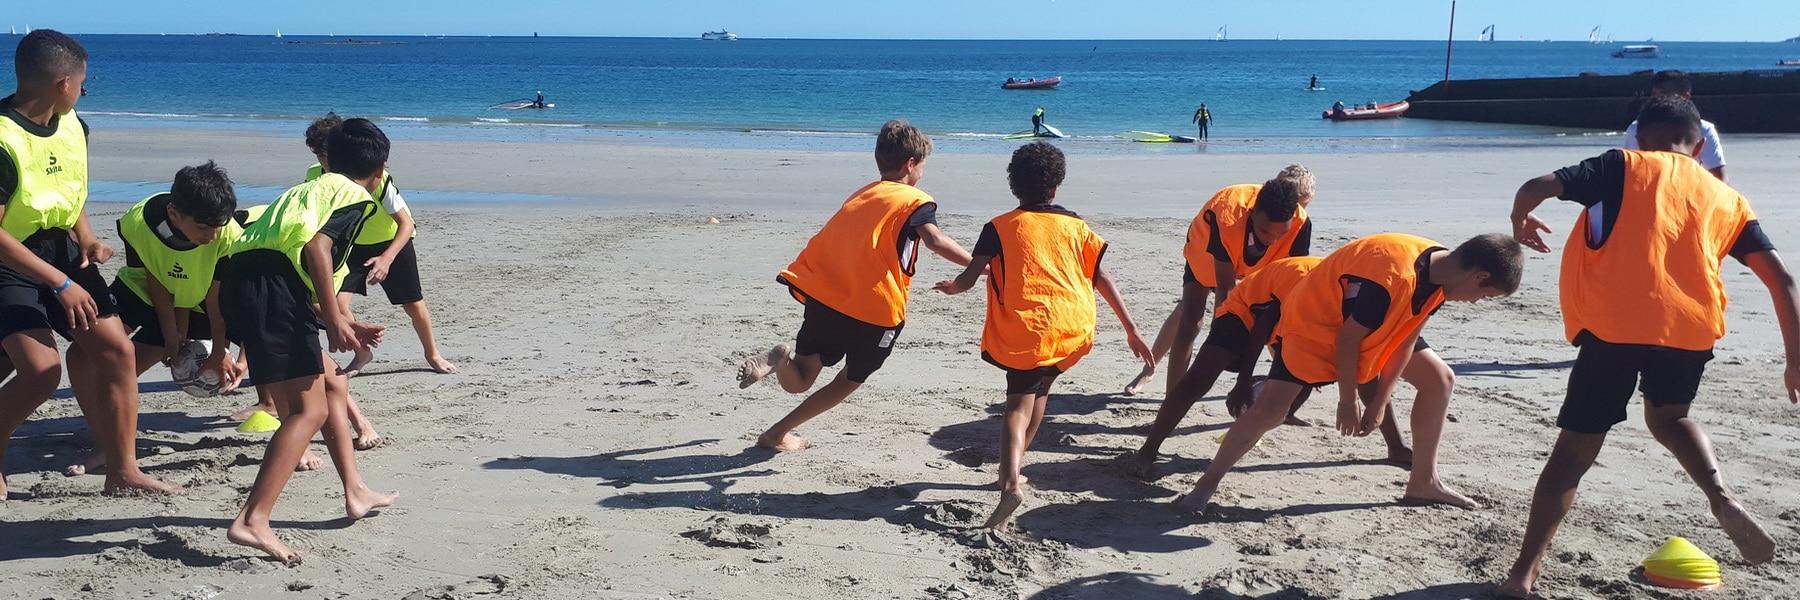 Jeunes stagiaires beach soccer bretagne plage